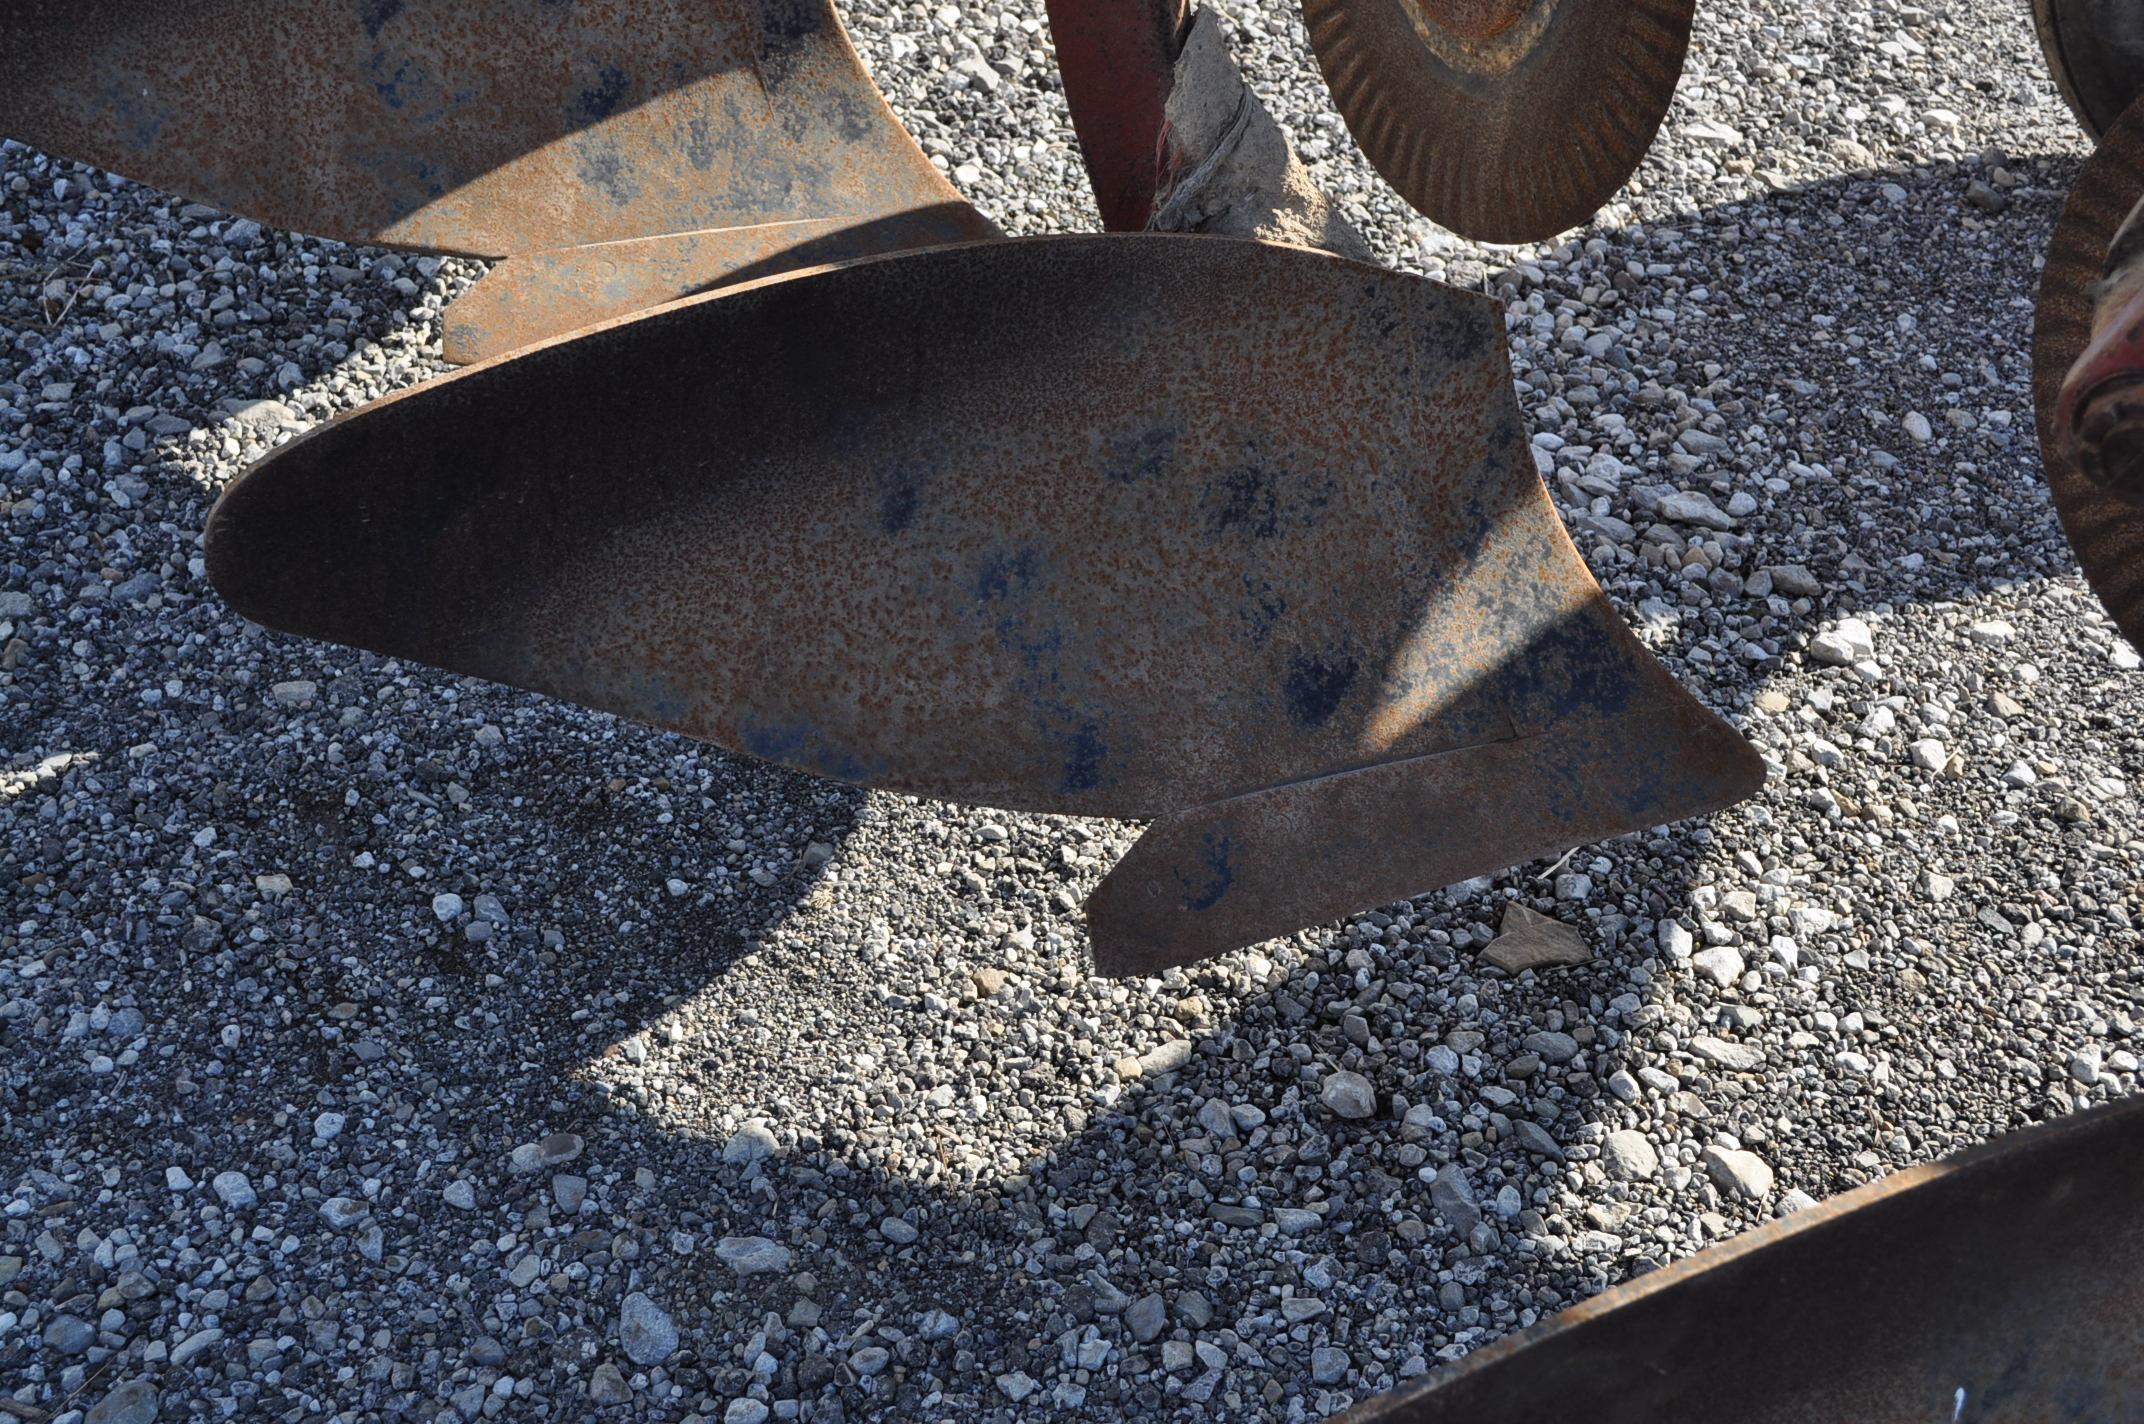 International 700 onland moldboard plow, 7 btm, auto reset trip - Image 10 of 16